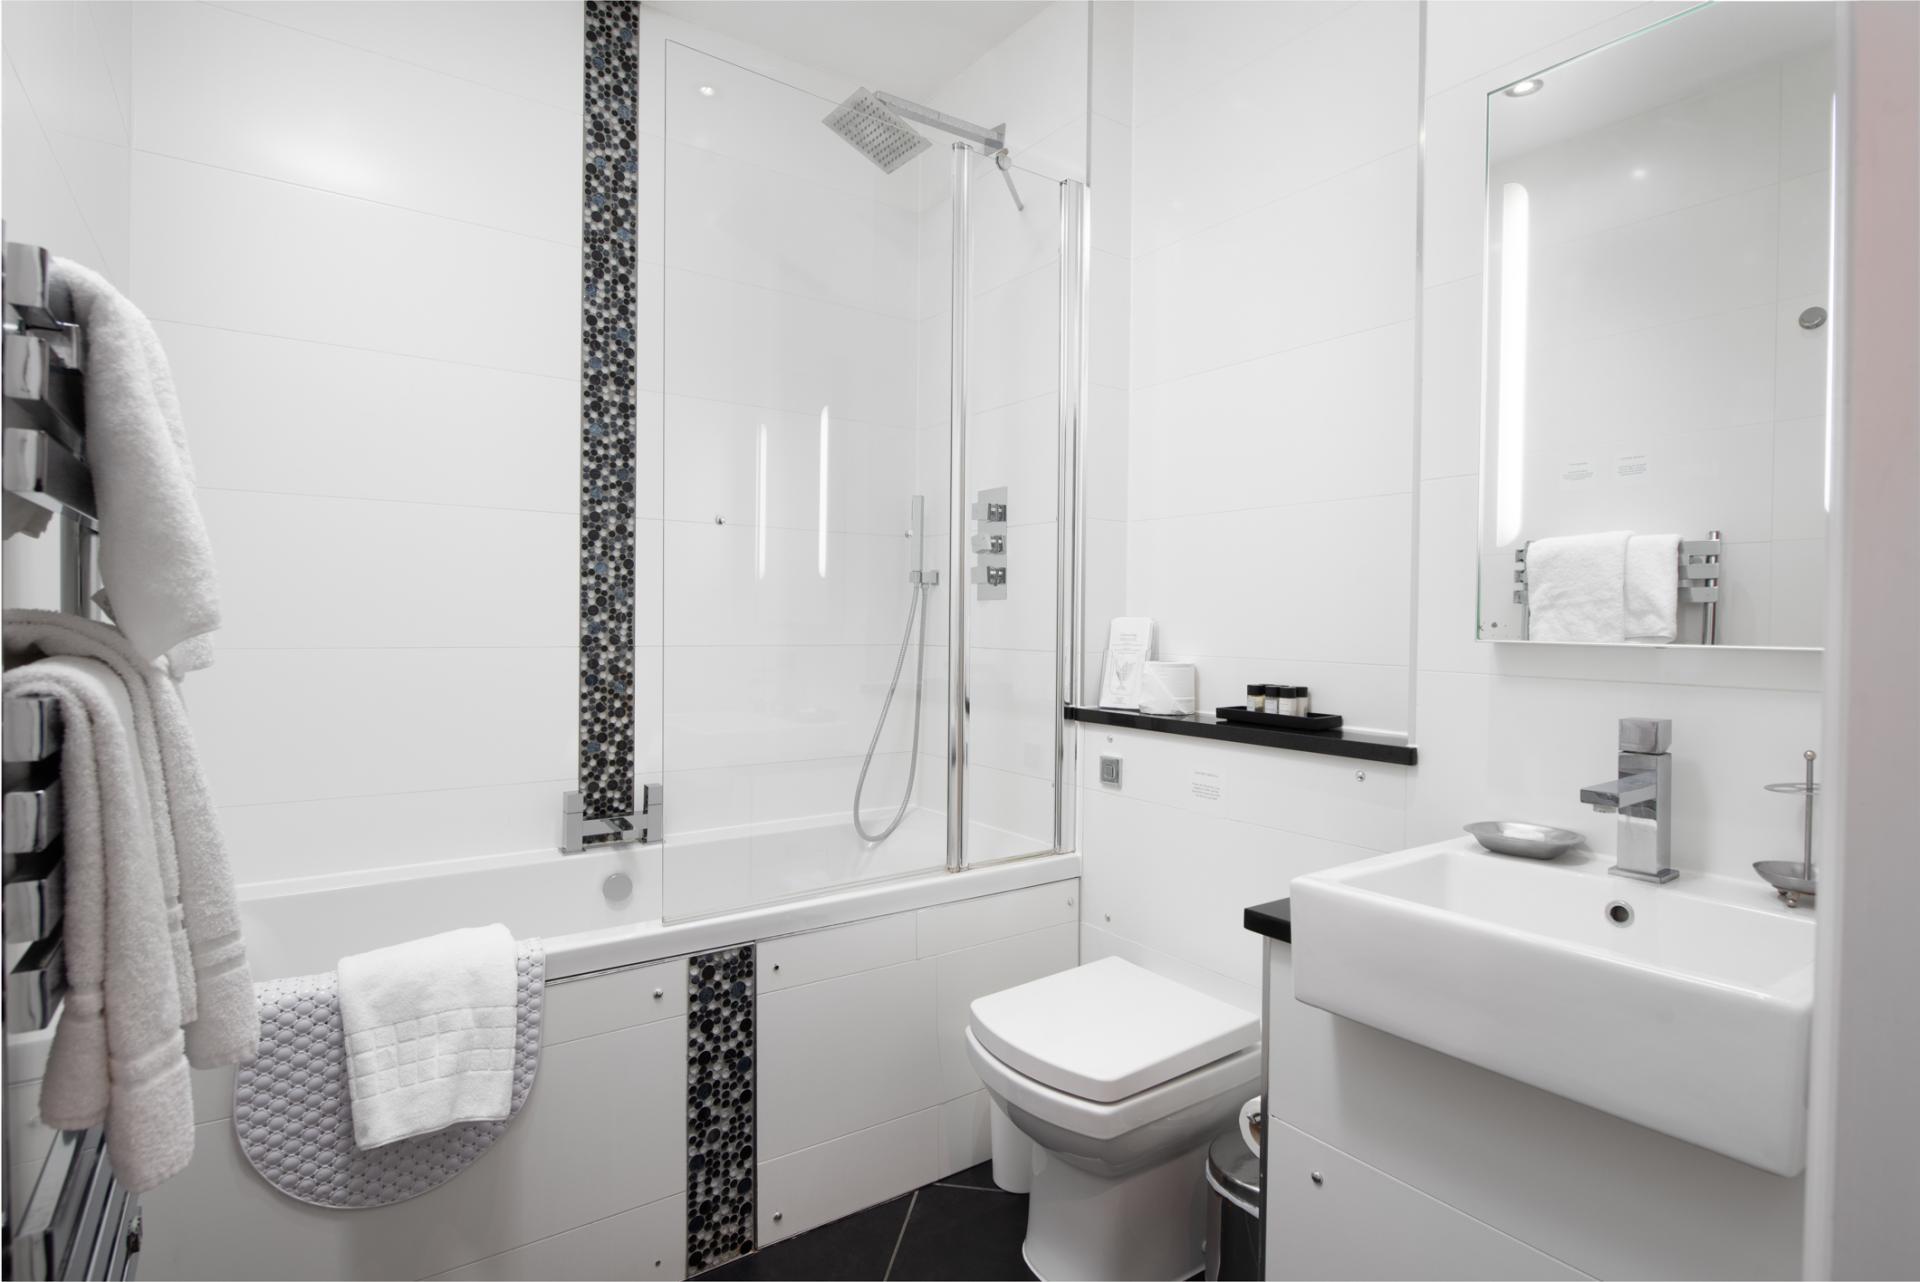 Bathroom at Chelsea Green Apartments, Chelsea, London